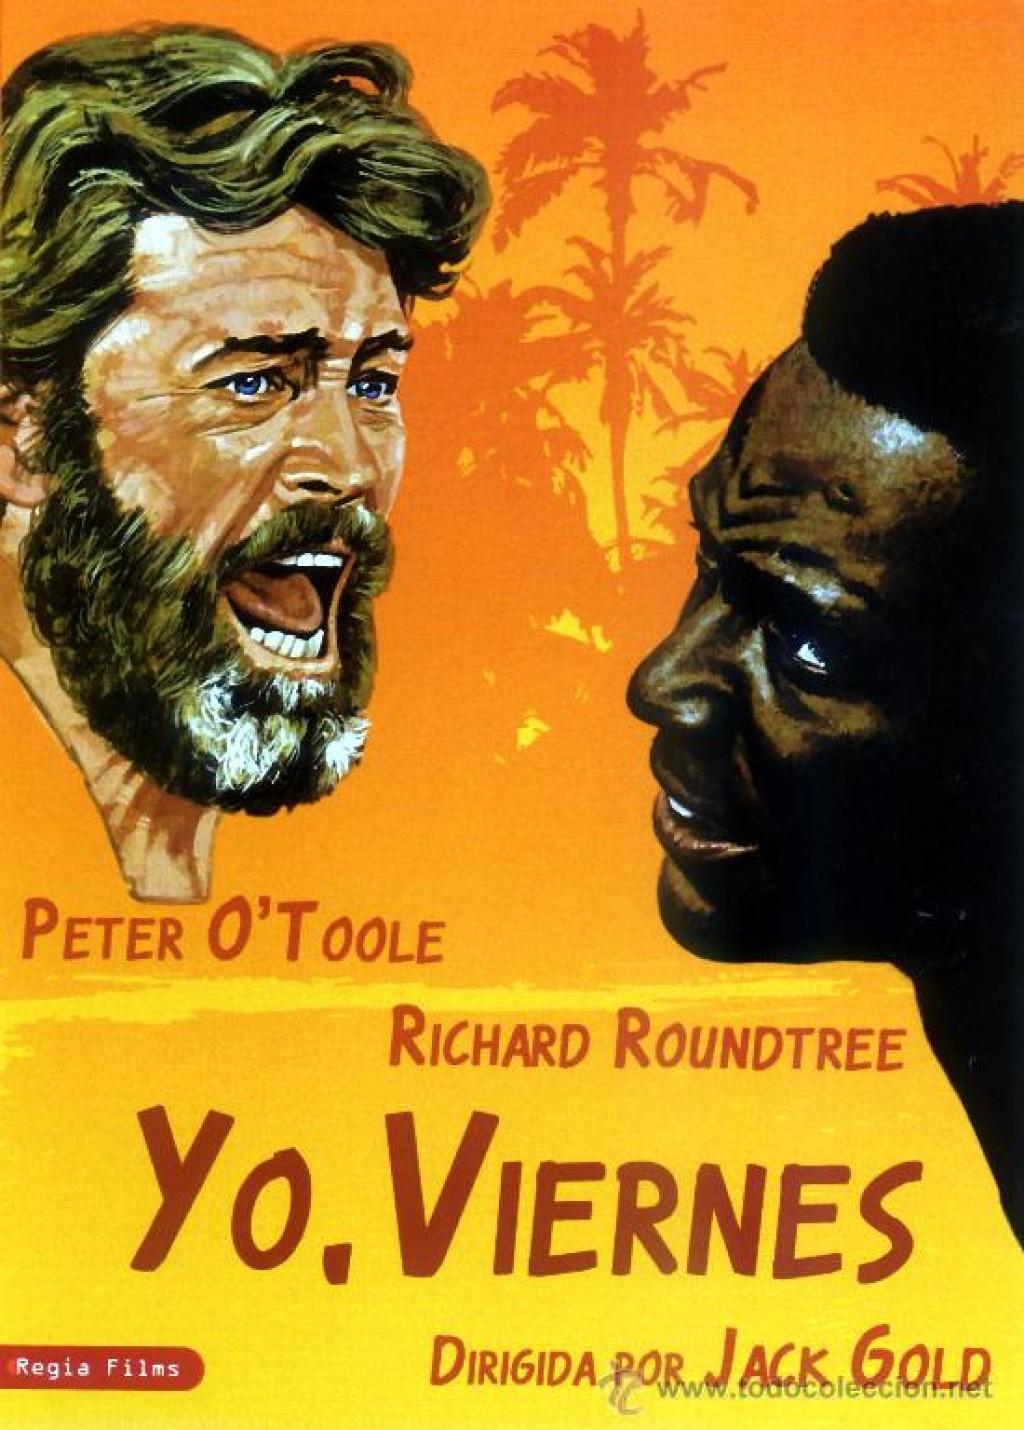 https://static.filmin.es/img/resources/web/film/poster/poster-resized/yo-viernes.jpg